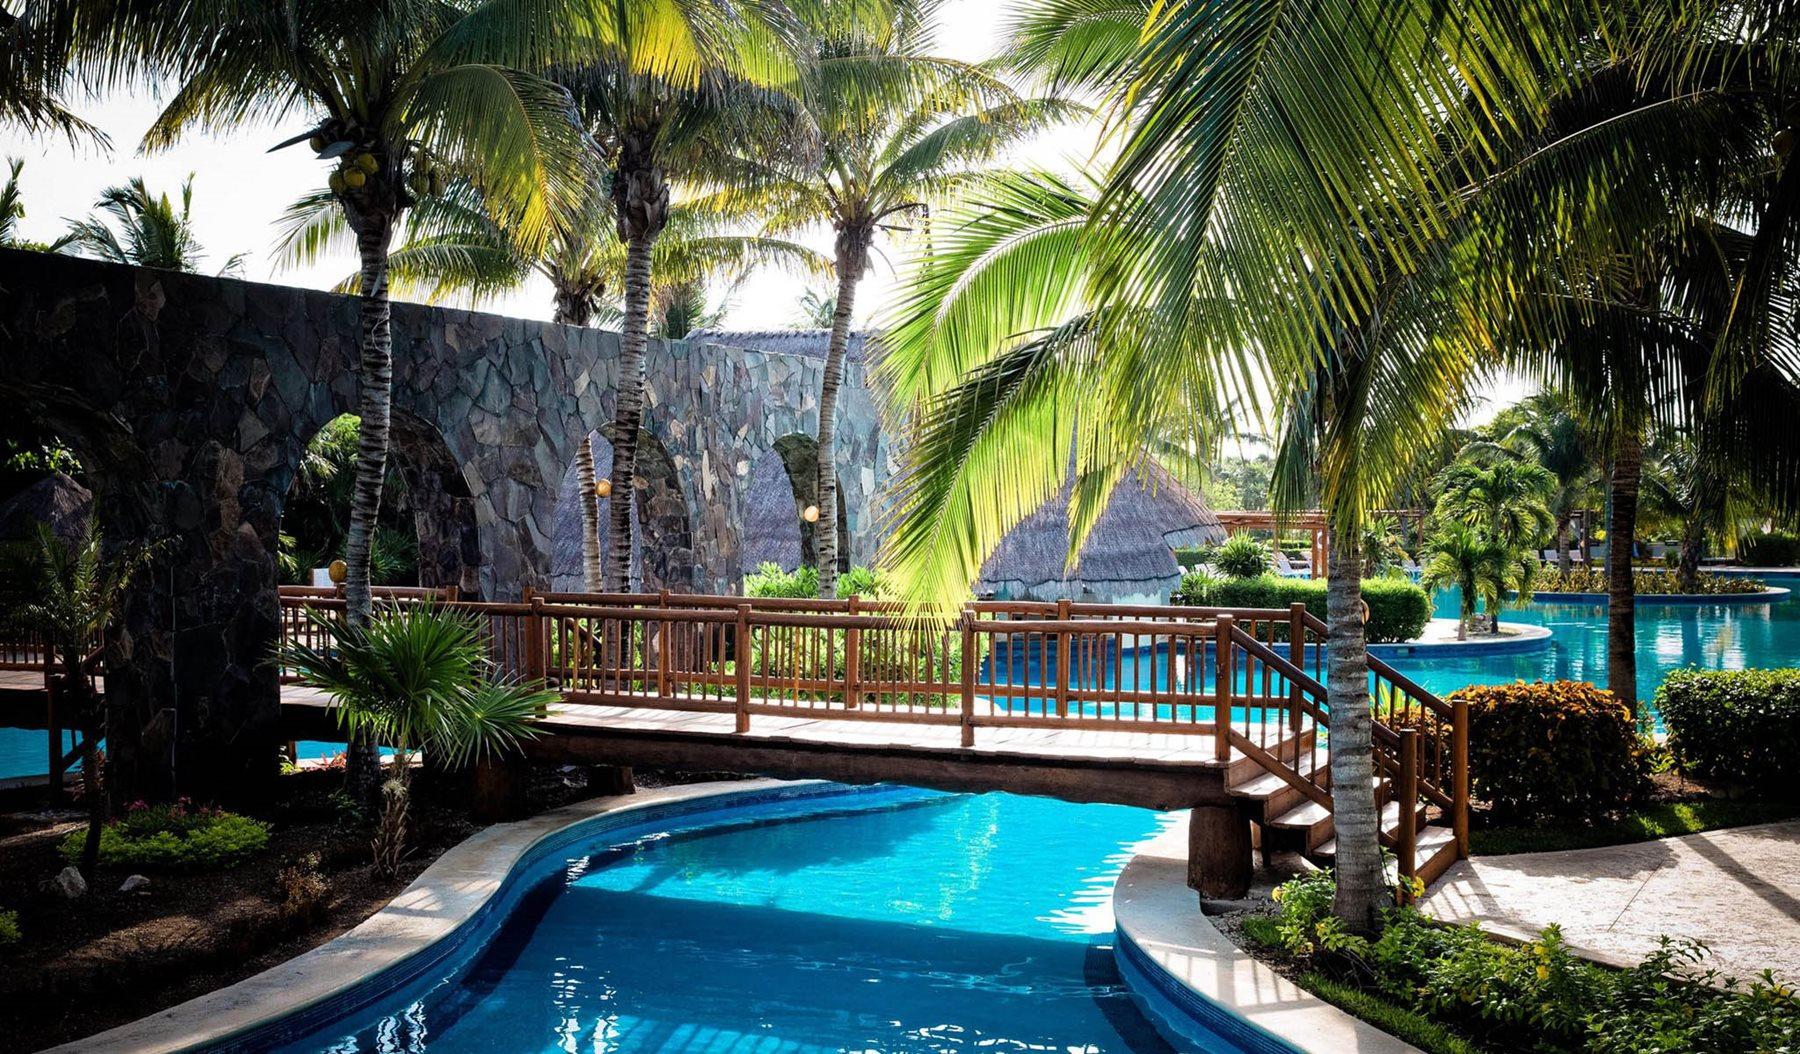 RIV-Valentin-Imperial-Maya-Pool-005